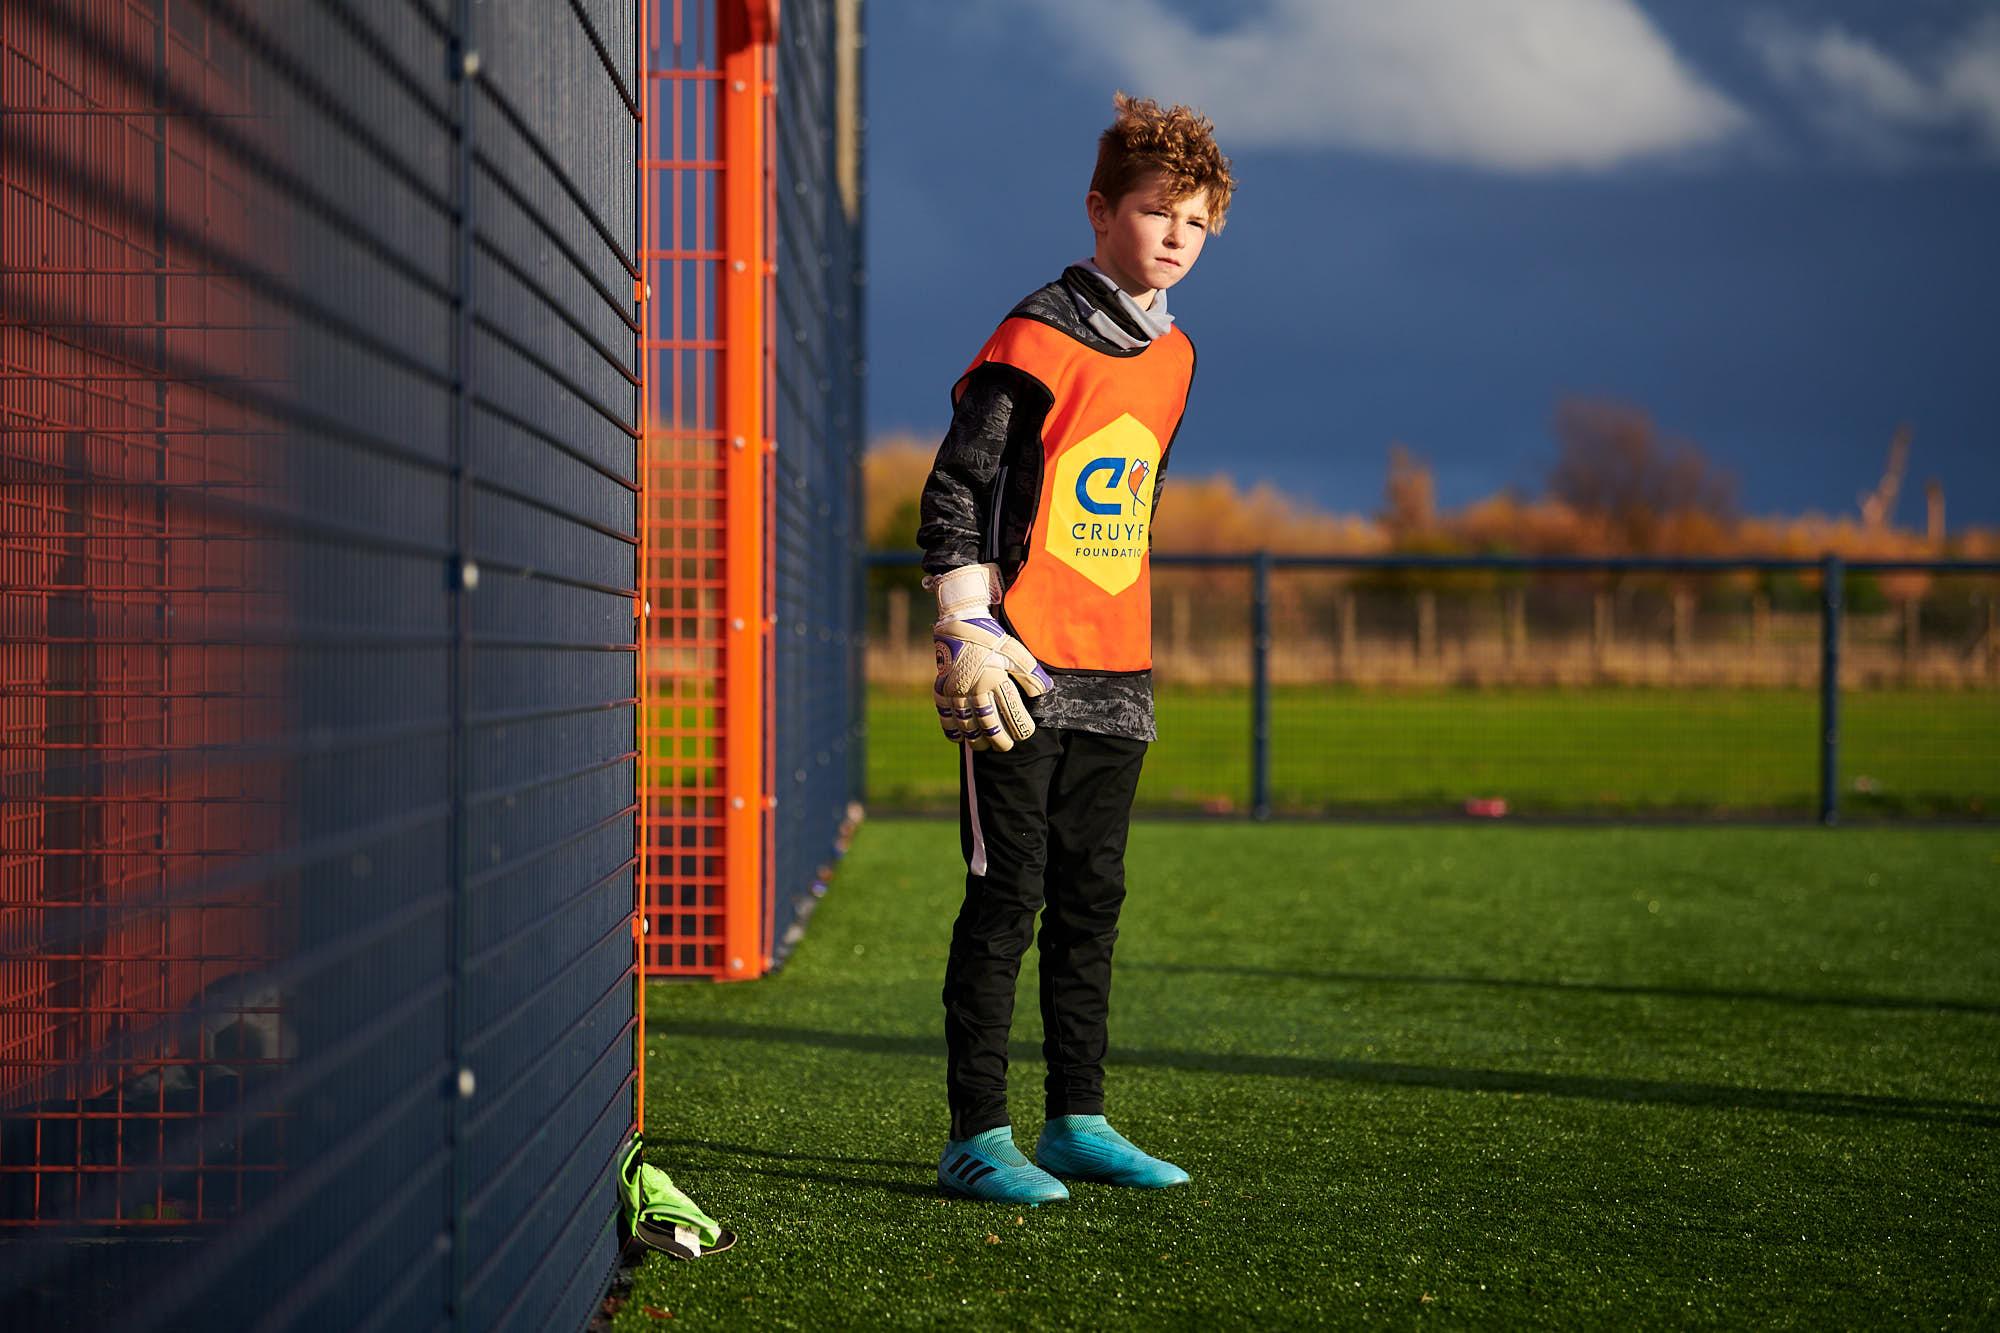 Goalkeeper on a Cruyff Court in Aberdeen